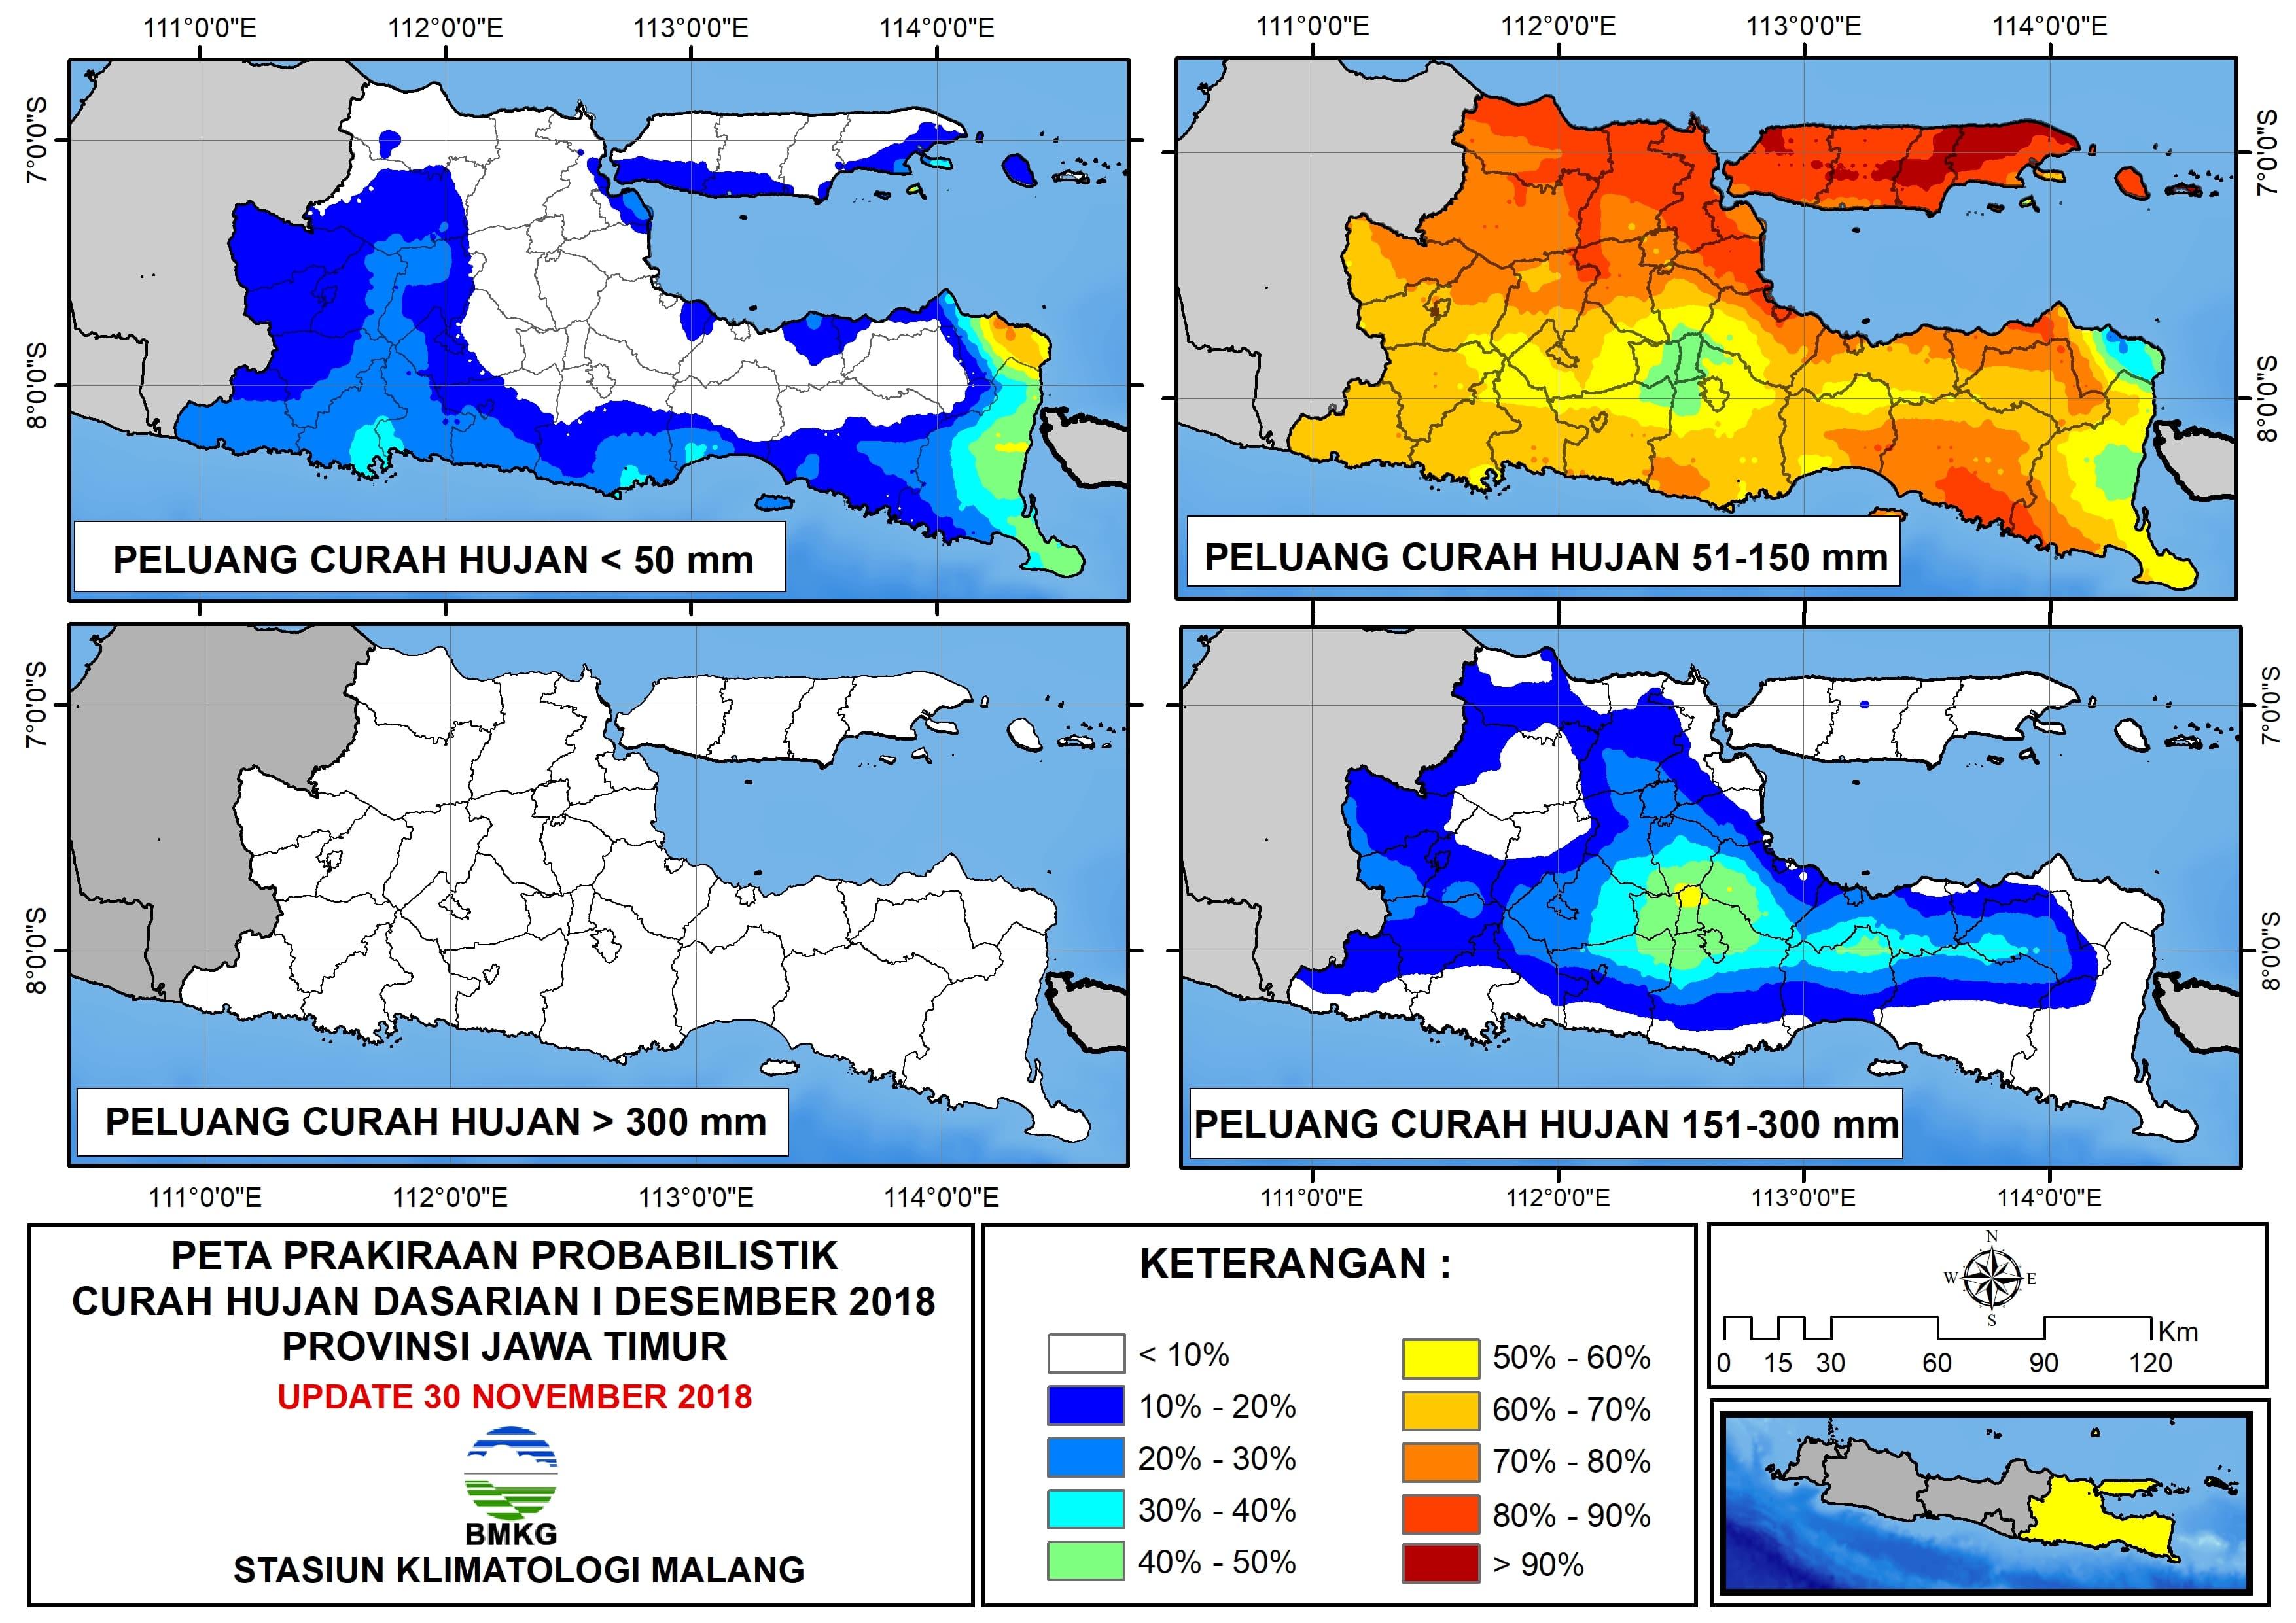 Peta Prakiraan Probabilistik Curah Hujan Dasarian I Desember Provinsi Jawa Timur Update 30 November 2018